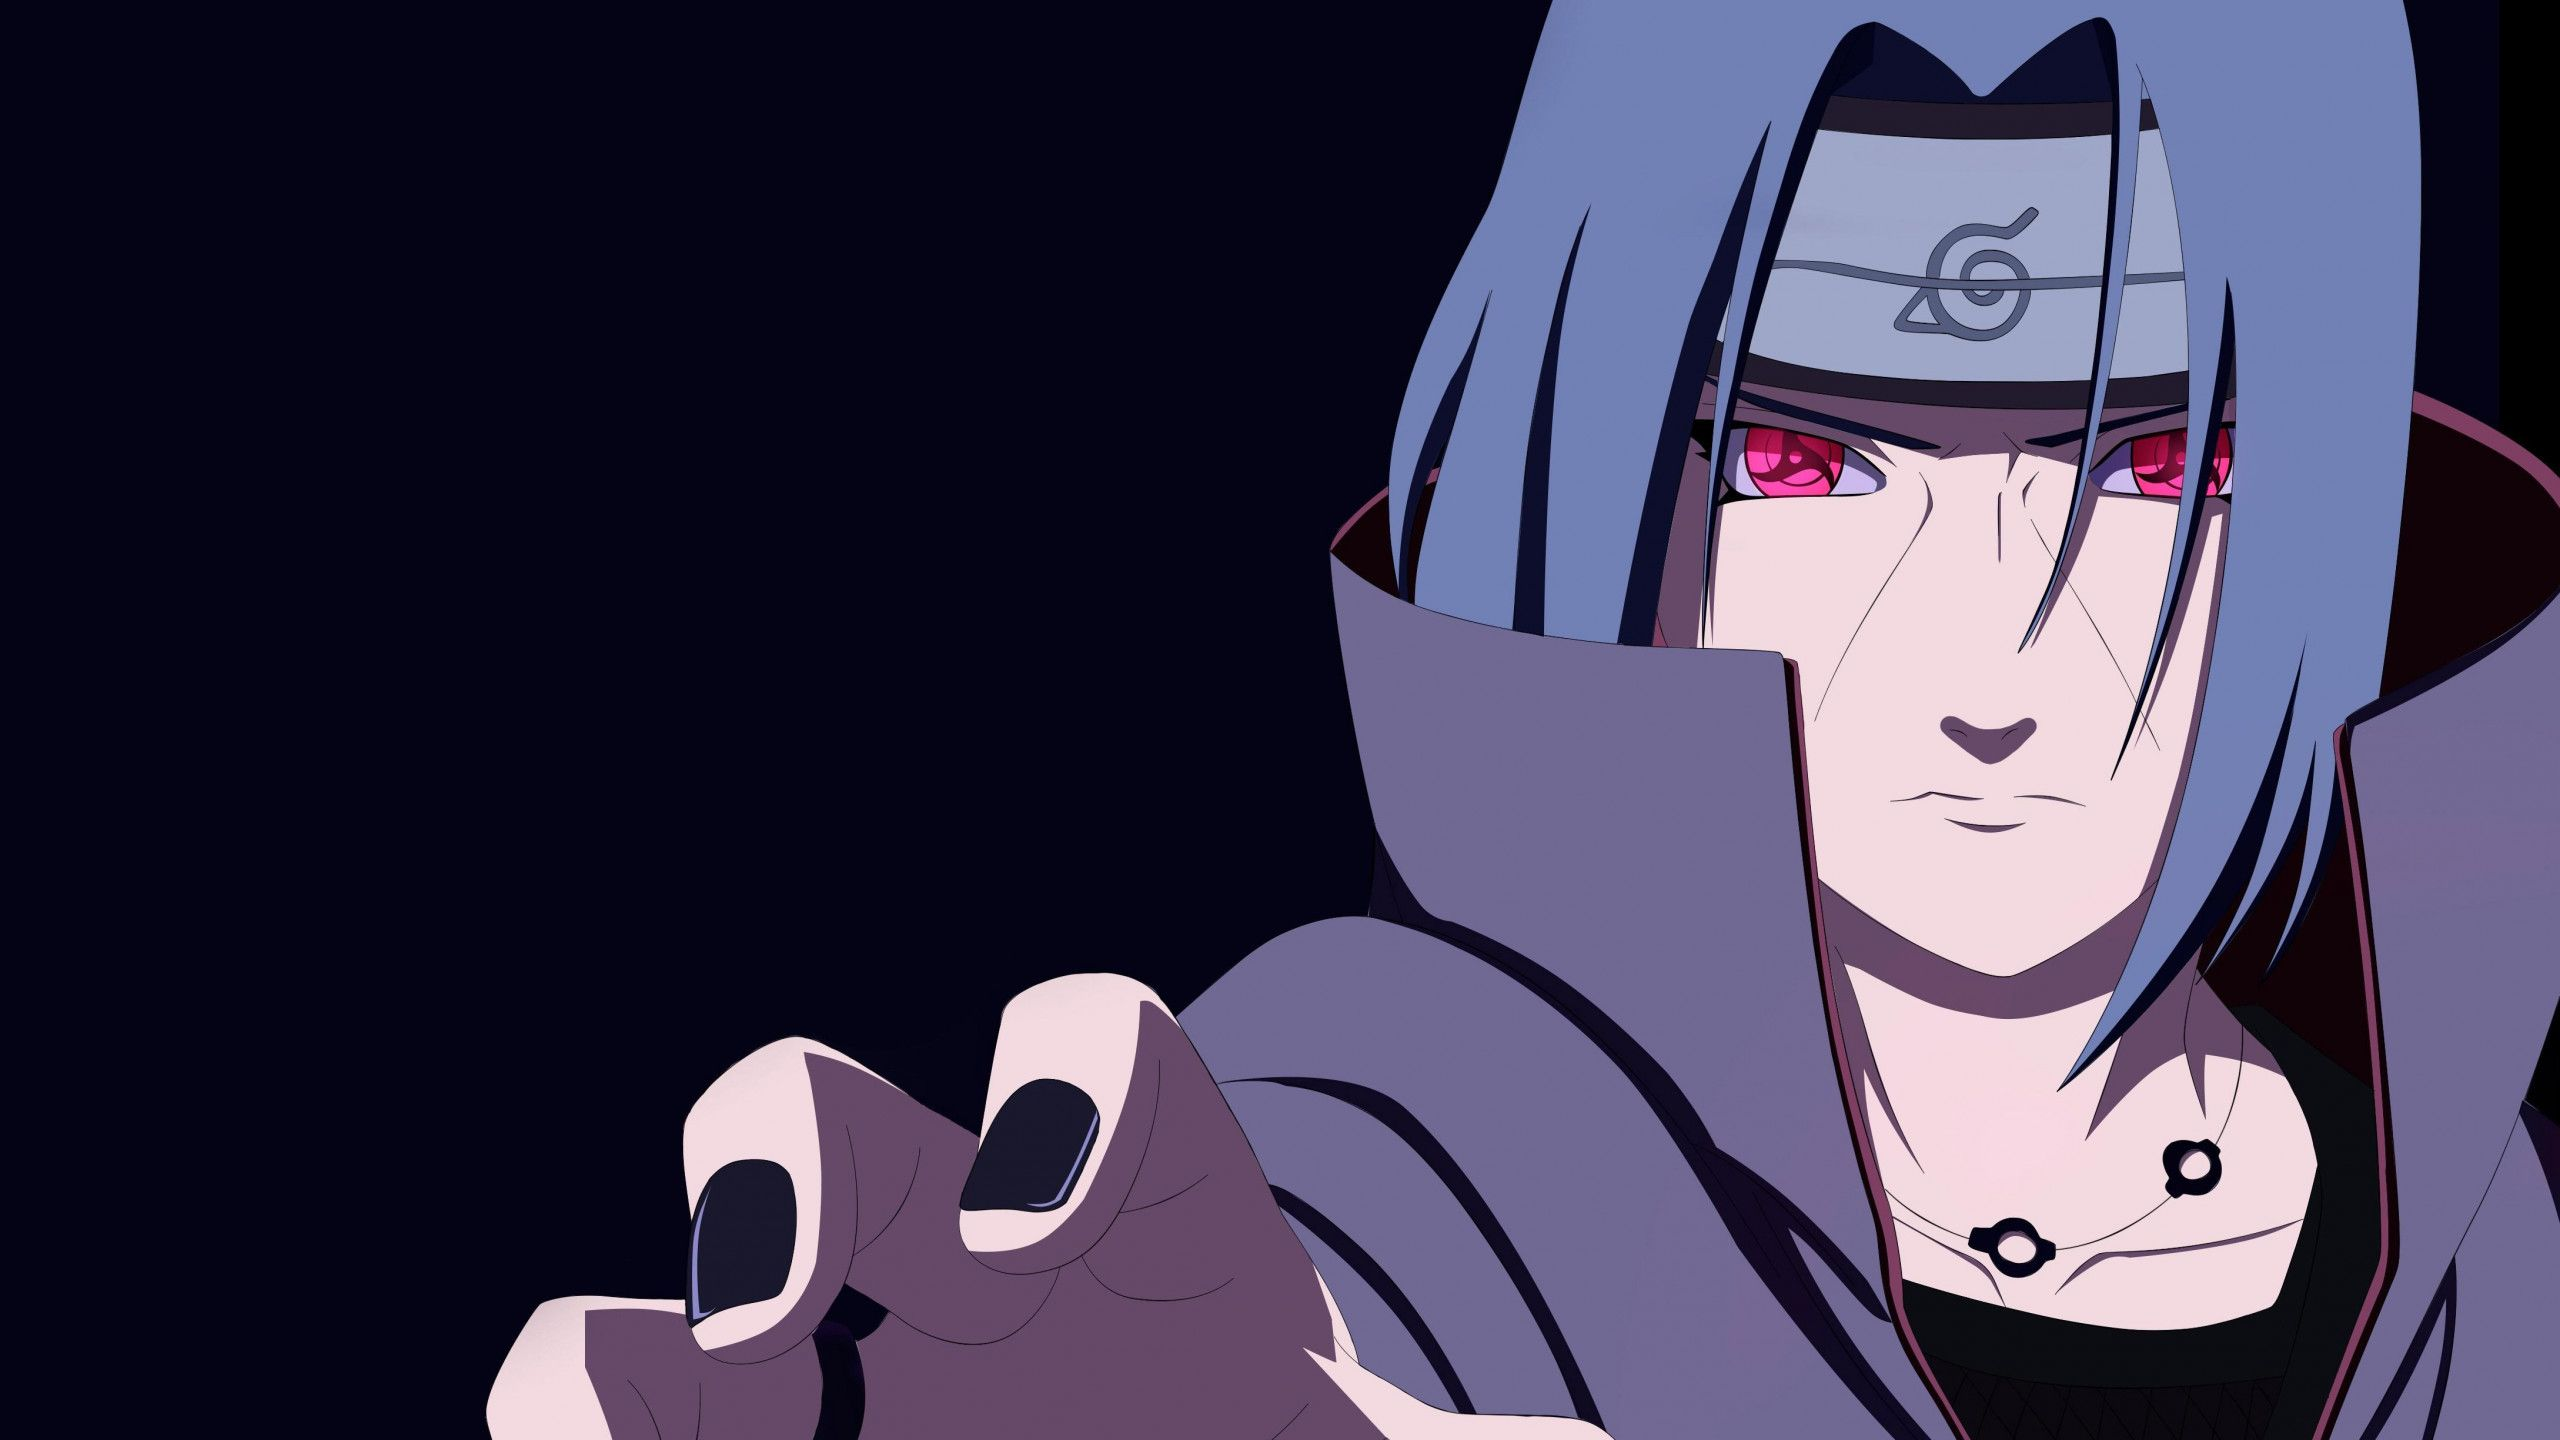 Res 2560x1440 Naruto Itachi Uchiha Mangekyou Sharingan